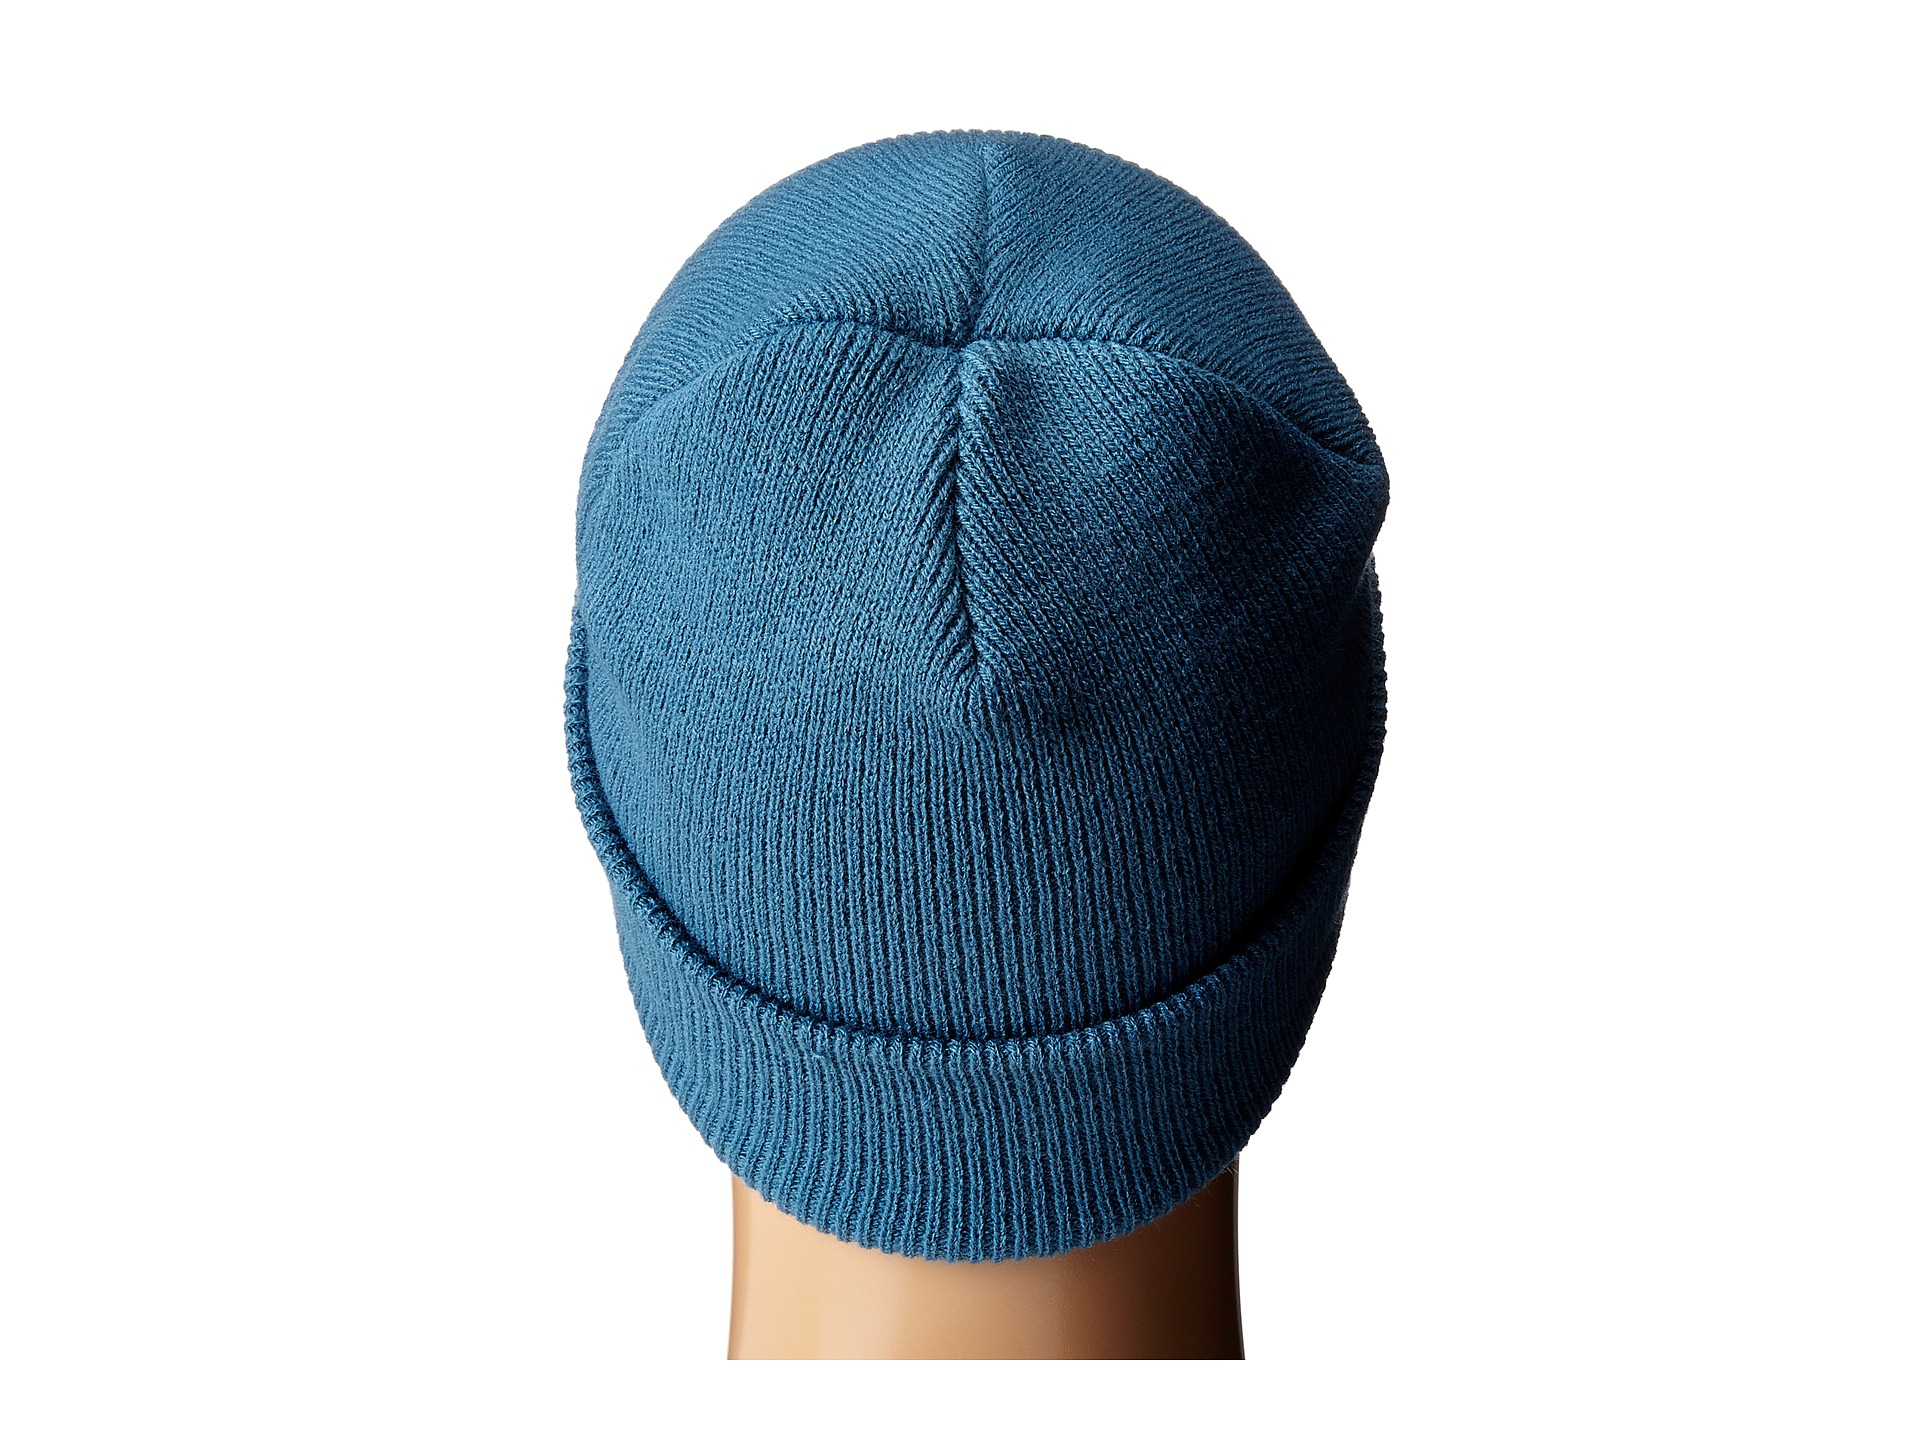 c9d30e06fa1c1 Lyst - Vans Milford Beanie in Blue for Men